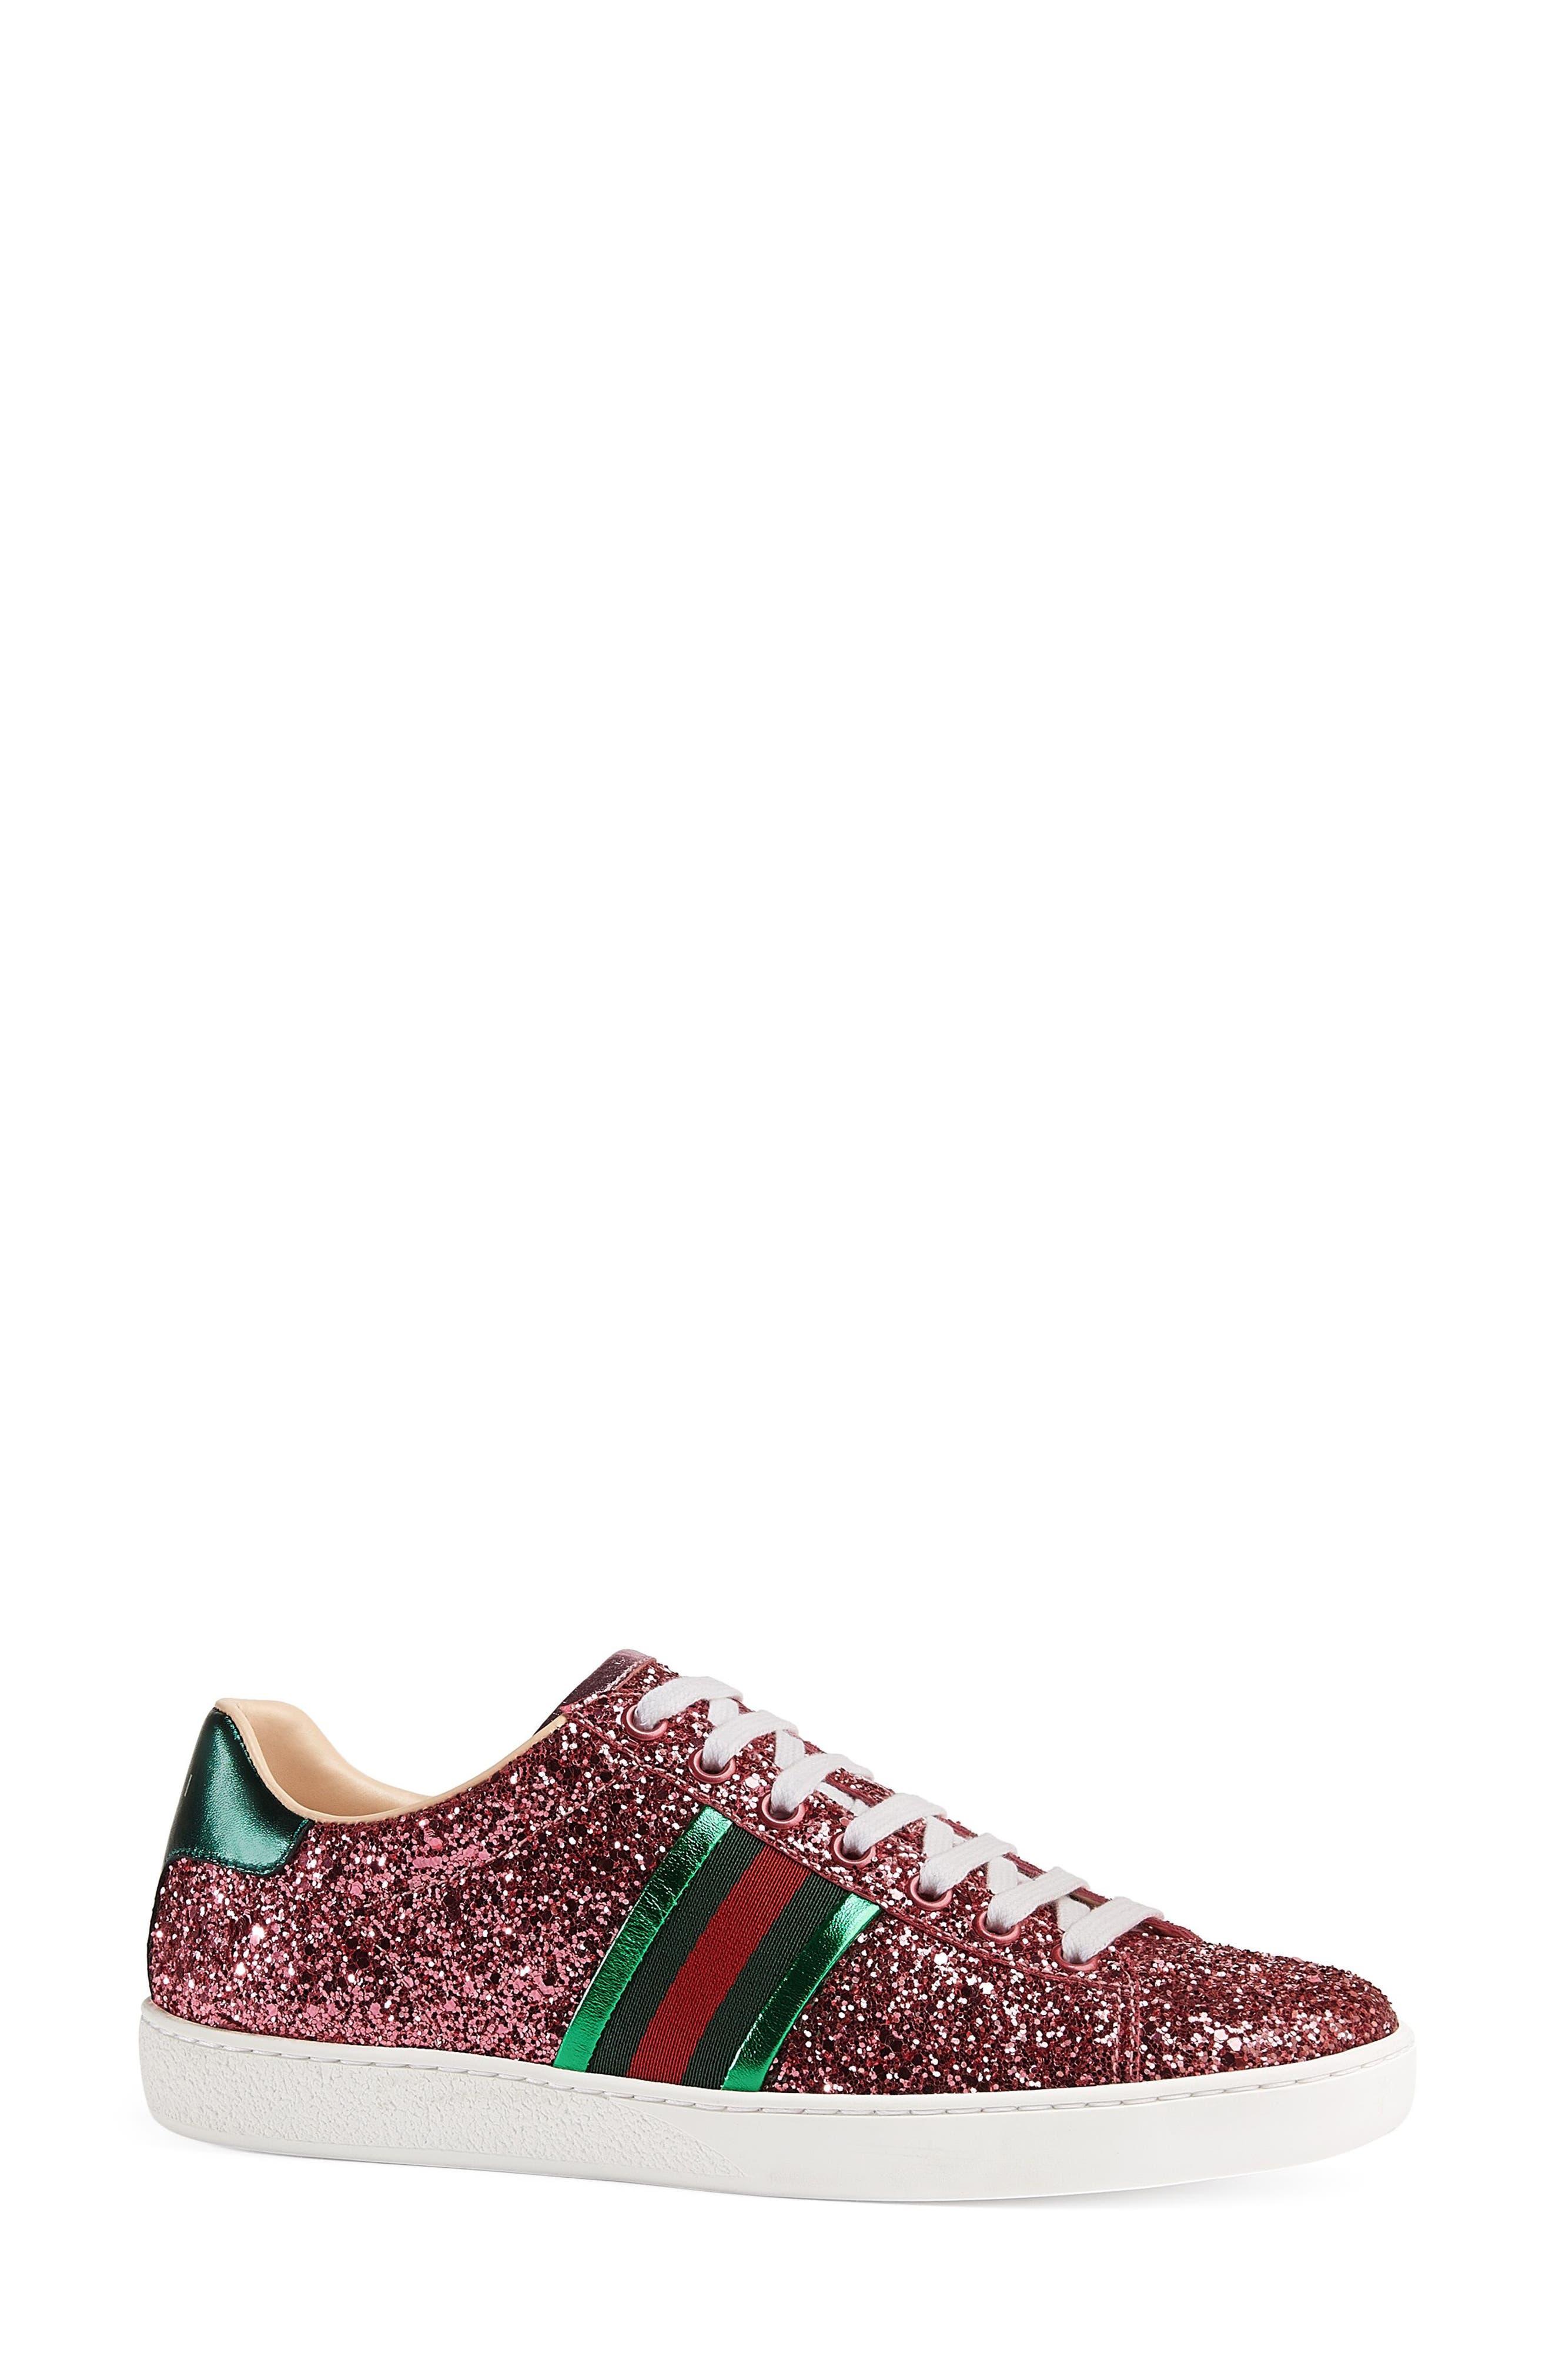 Alternate Image 2  - Gucci New Ace Glitter Sneaker (Women)